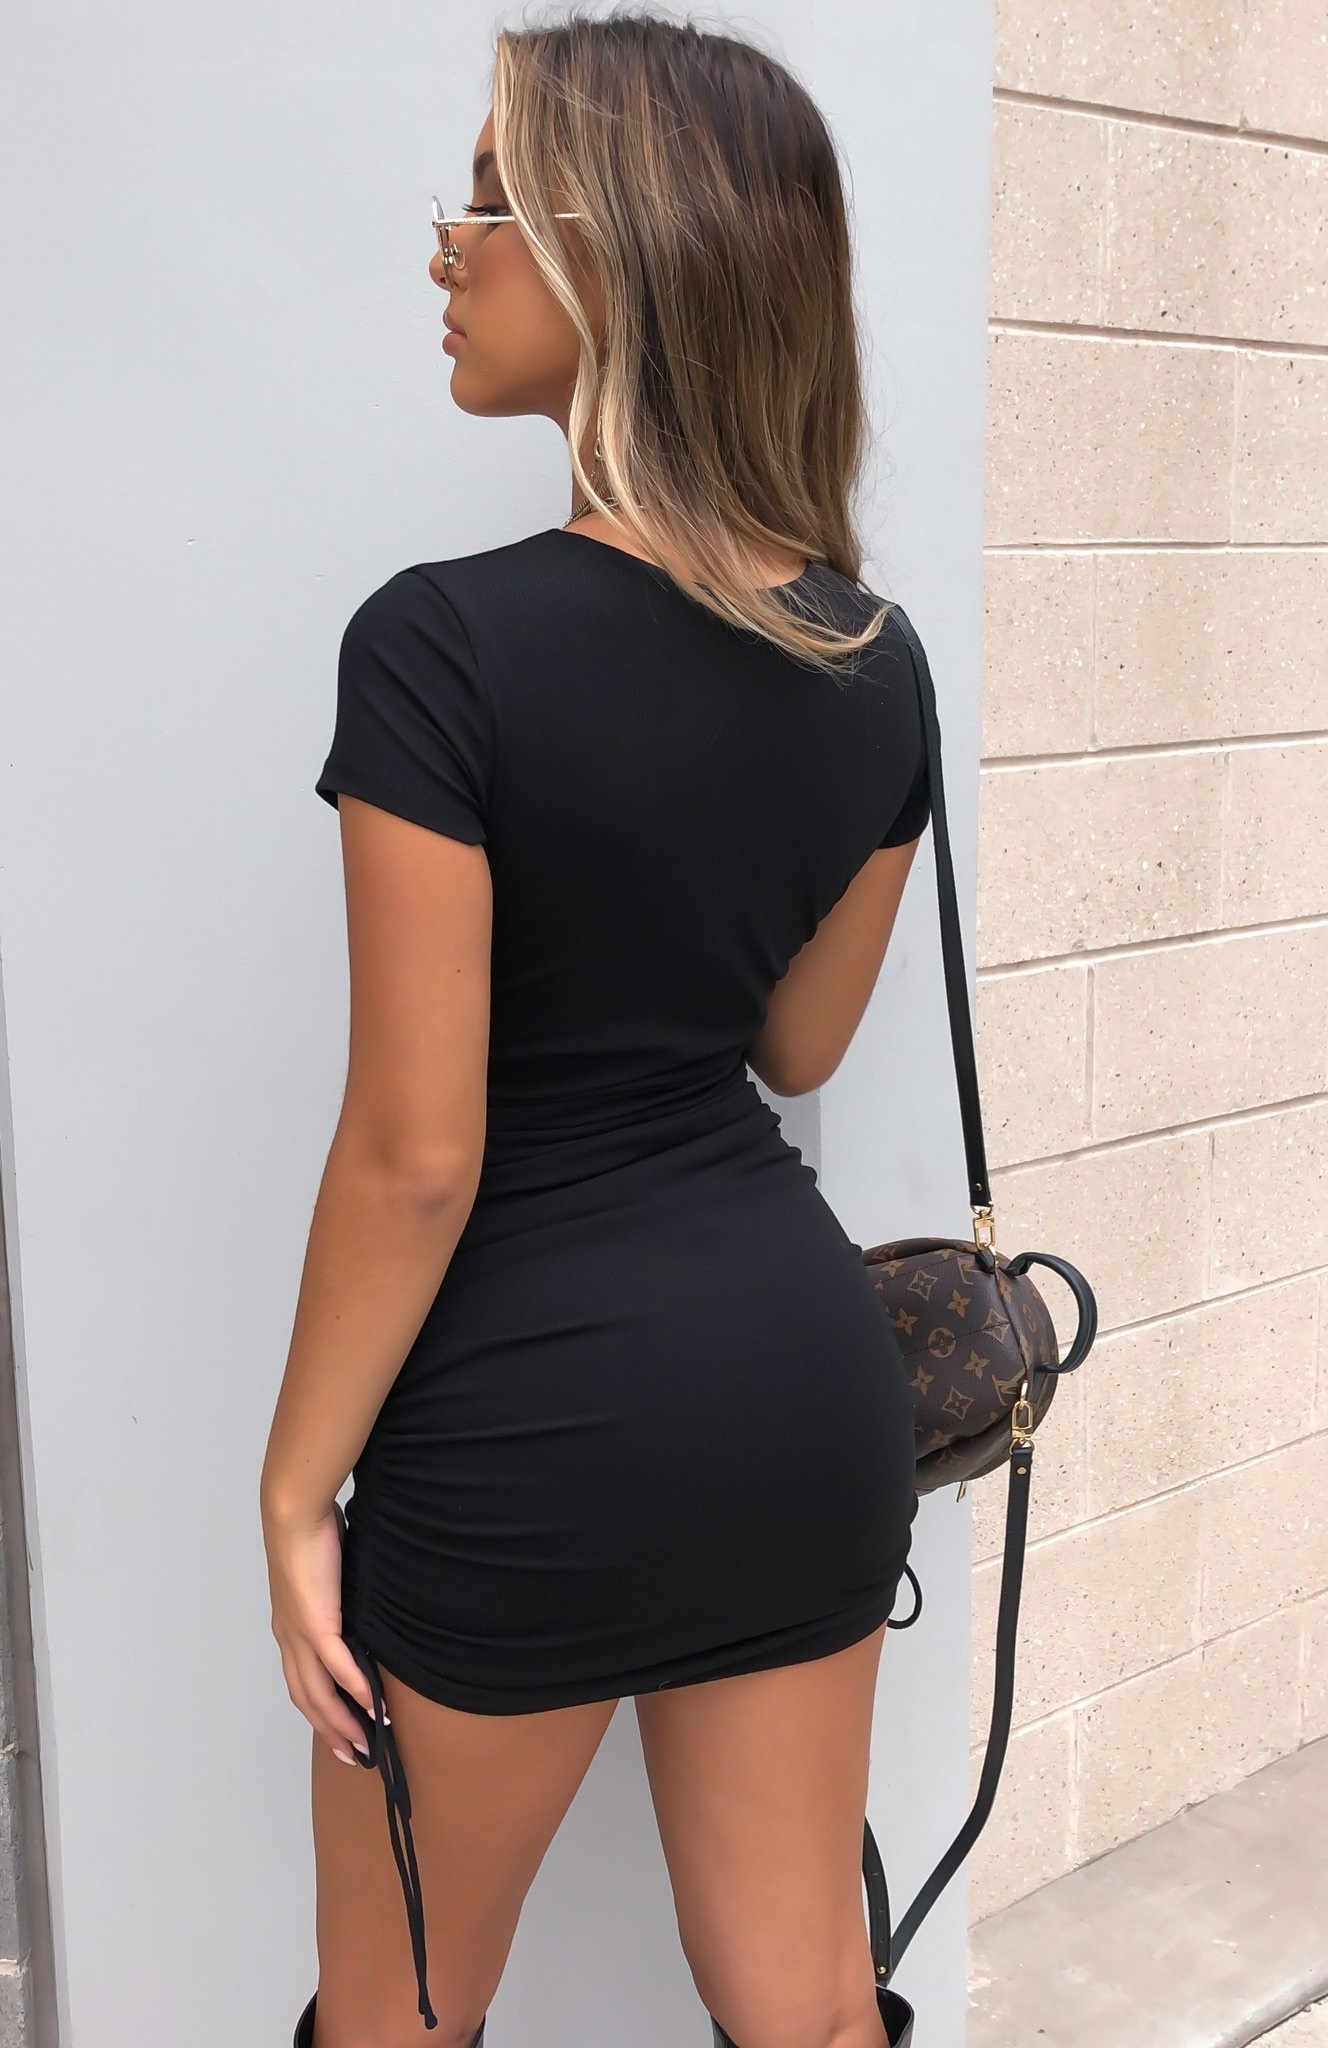 Mini Jurk Lexy zwart zwarte korte mini-dress-black dames jurken koordjes zijkanten kopen bestellen